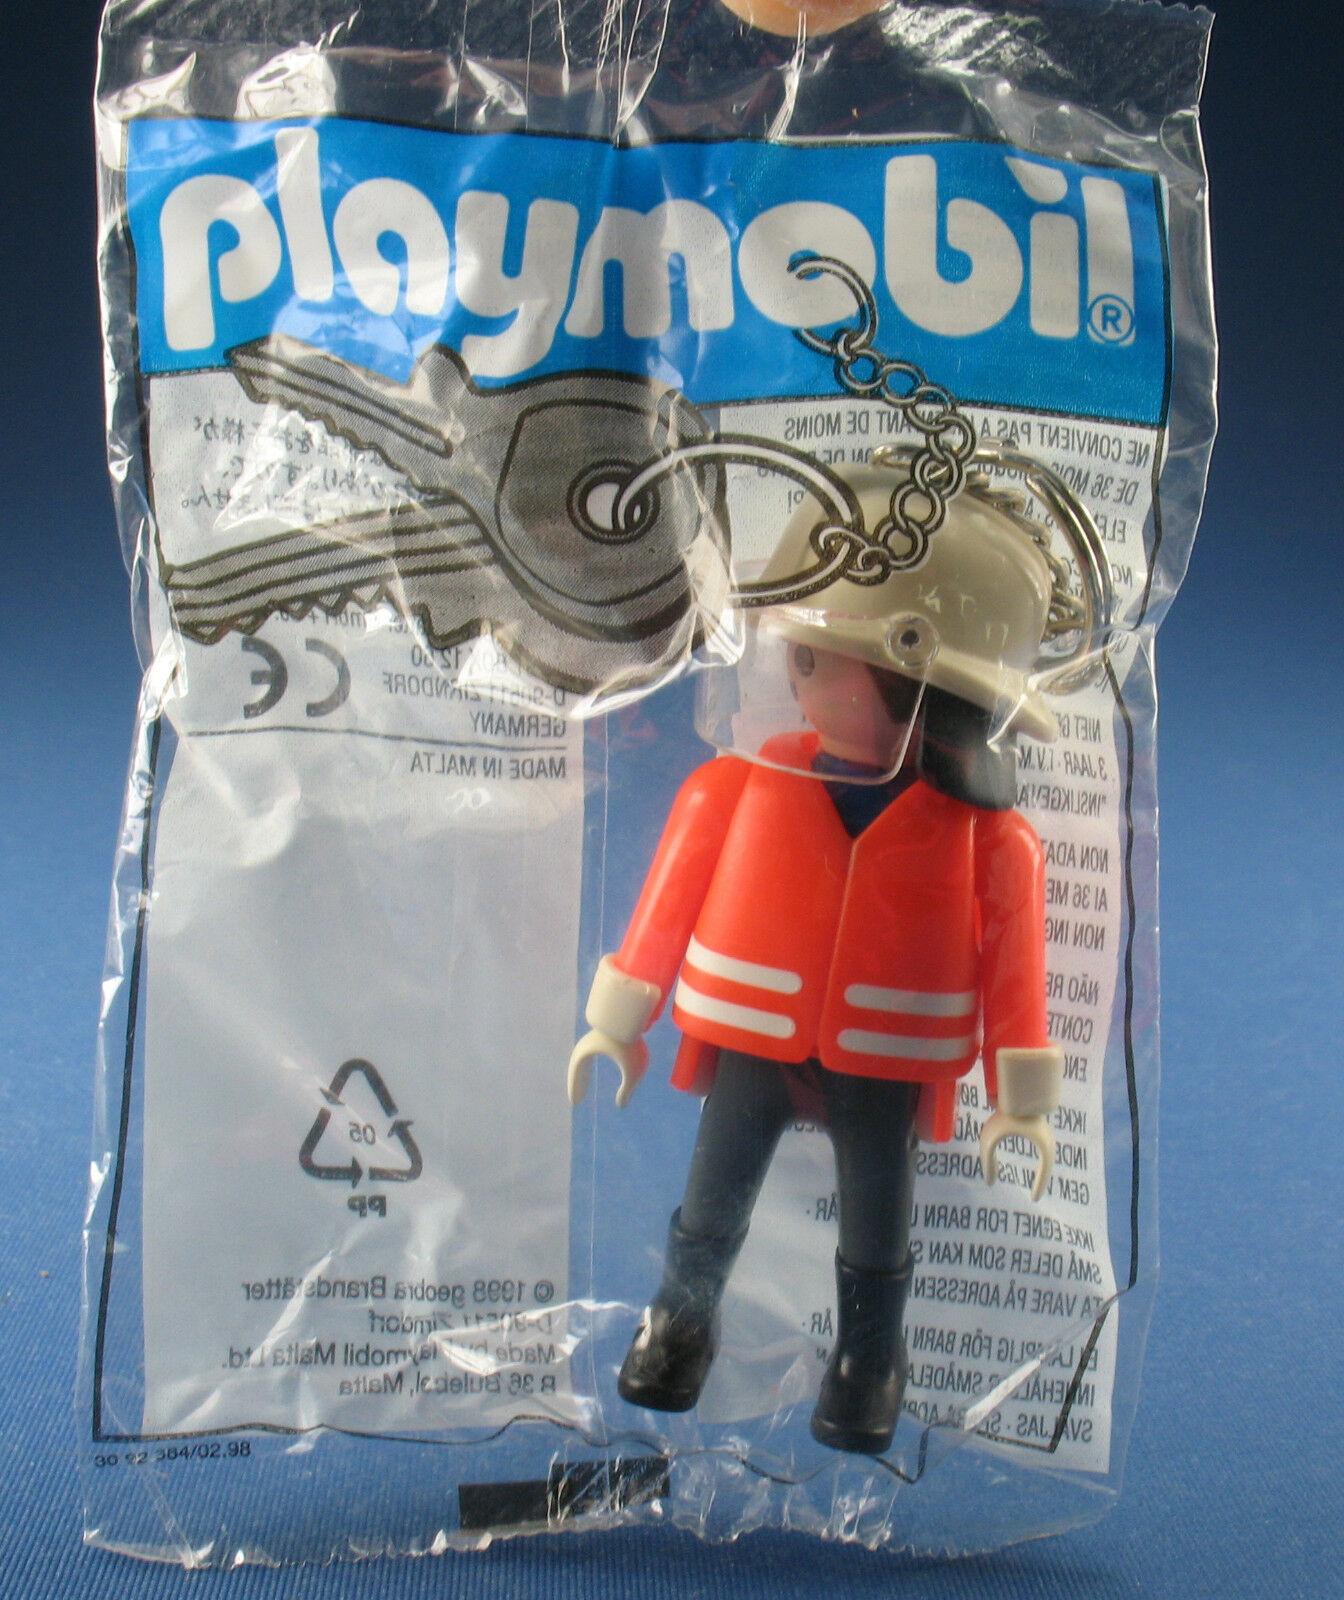 PLAYMOBIL 87904 - Schlüsselanhänger Feuerwehrmann - Fireman key chain - Neu  | Stil